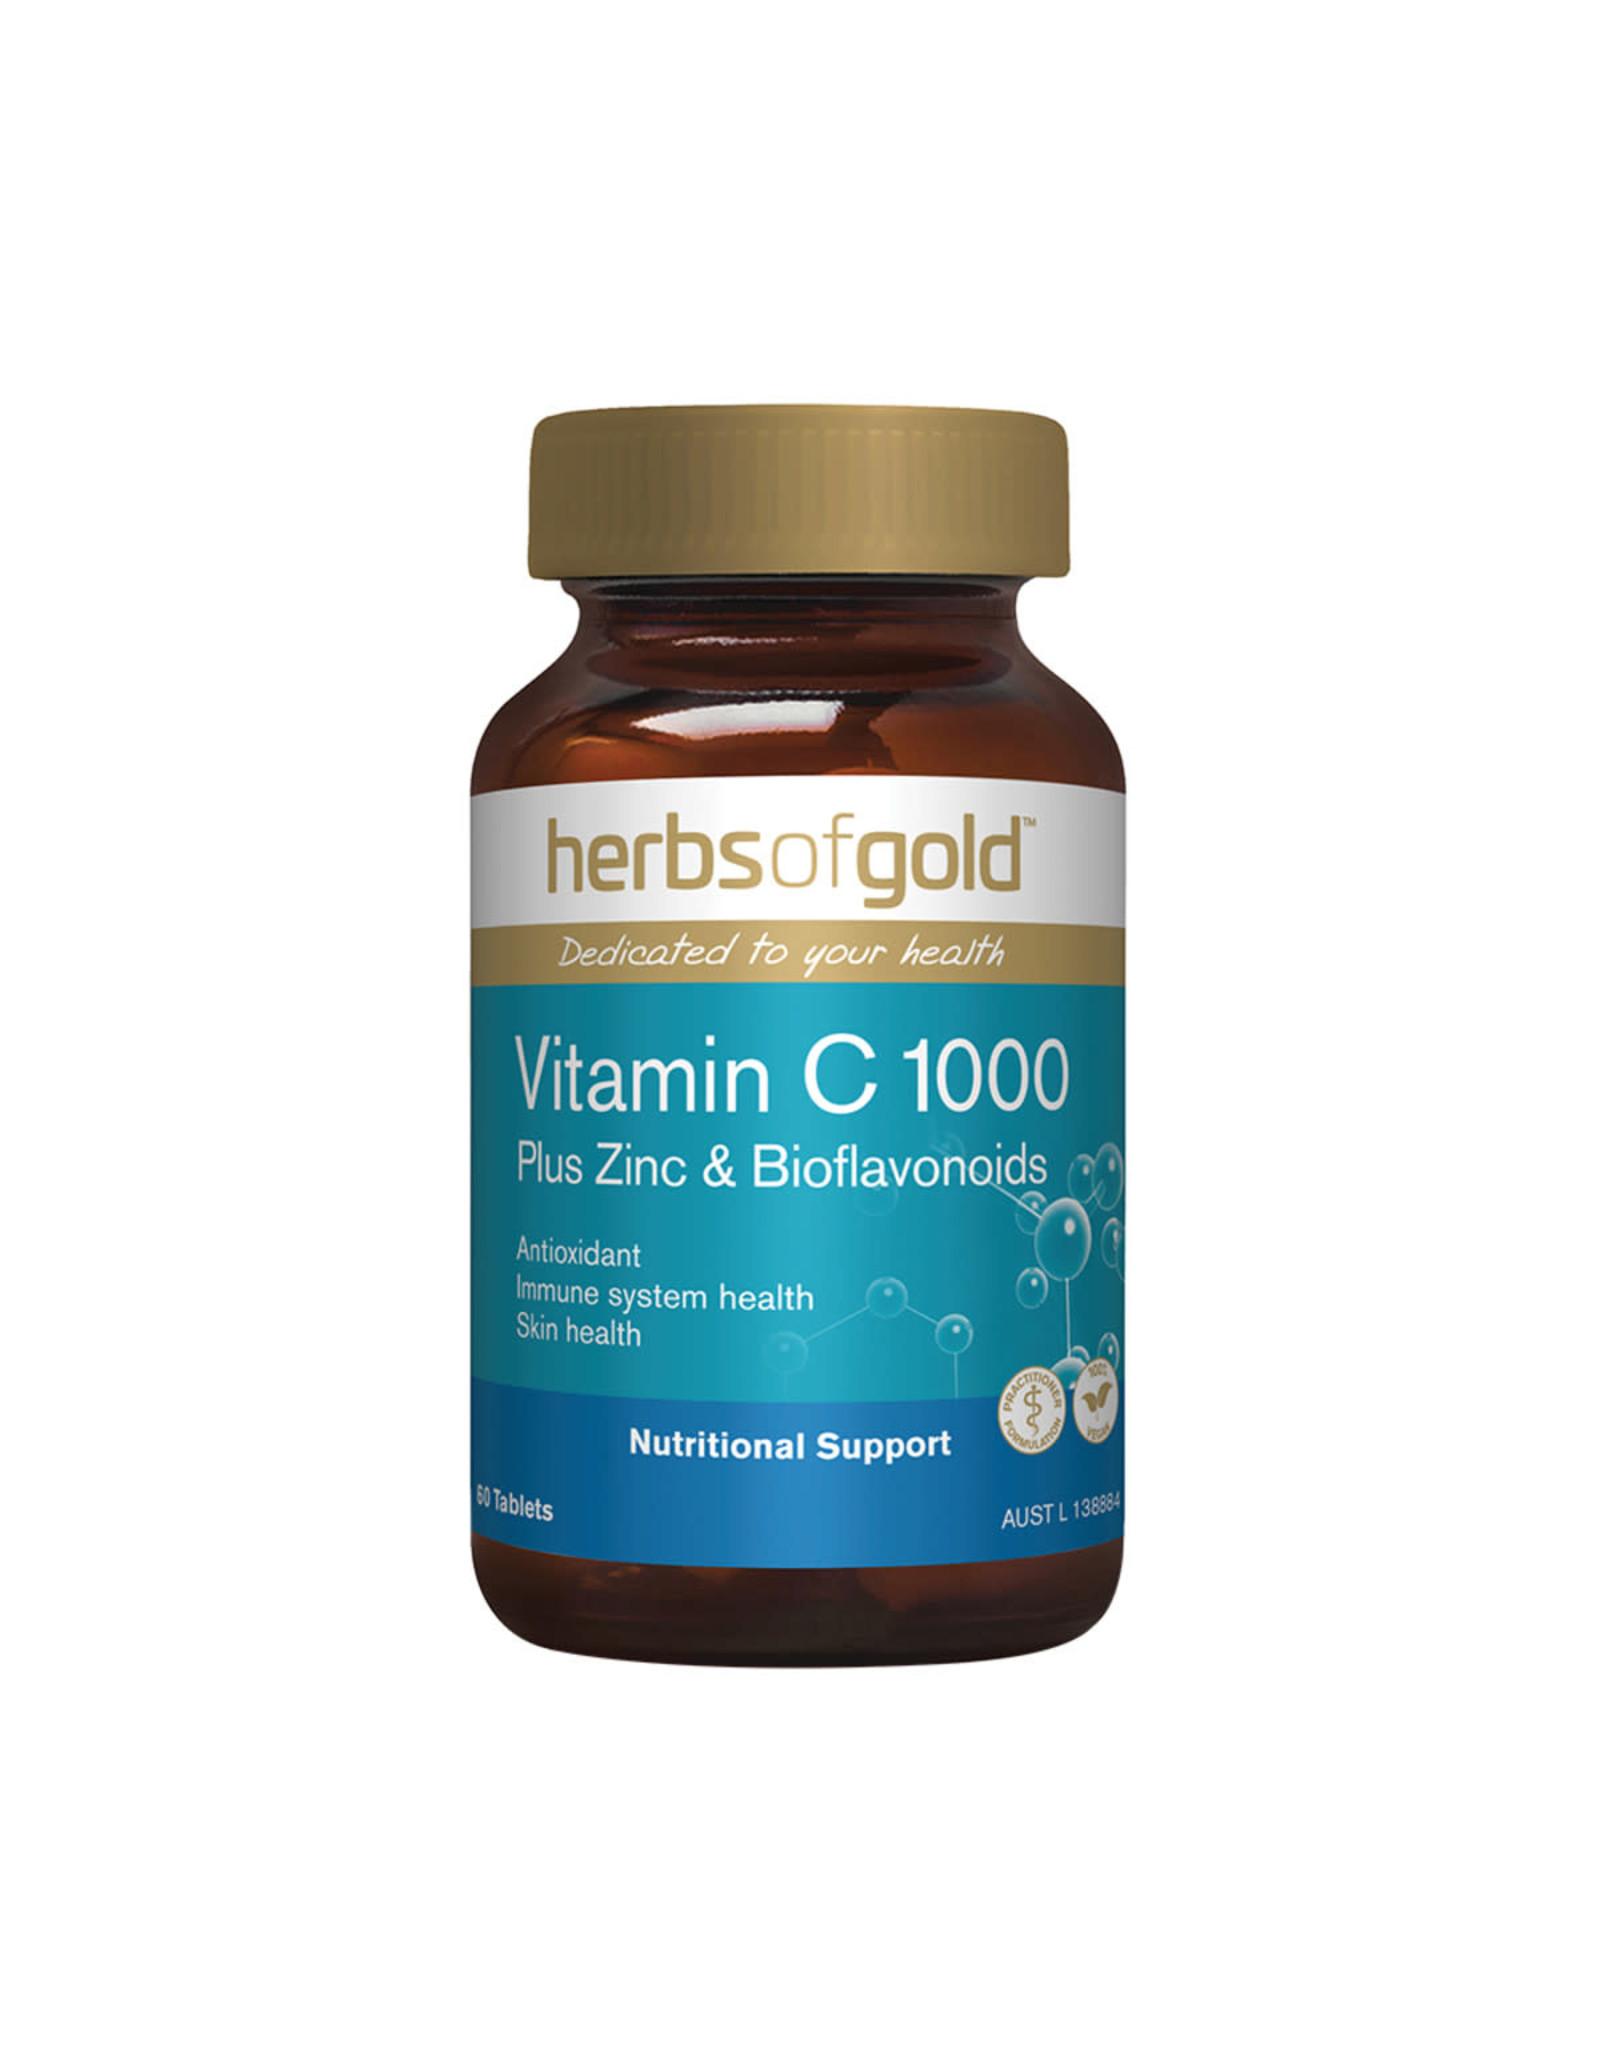 Herbs of Gold Vitamin C 1000 Plus Zinc & Bioflavonoids 60t